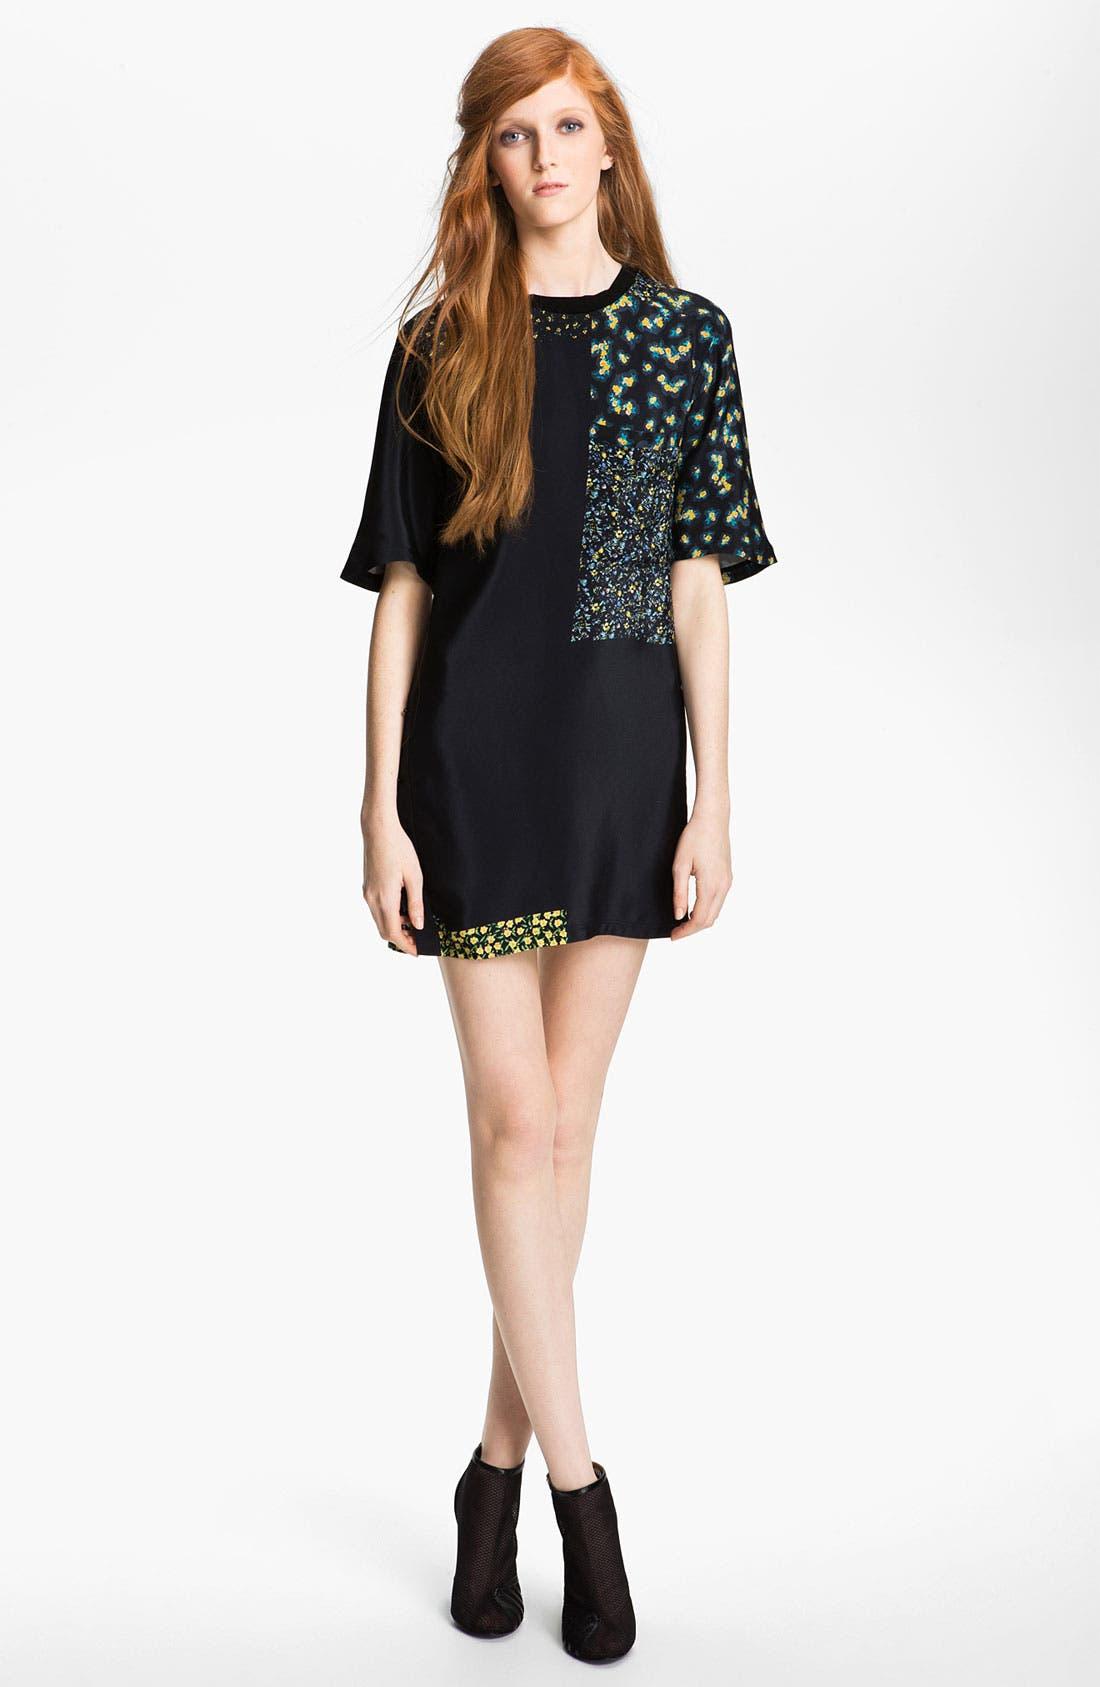 Main Image - 3.1 Phillip Lim Silk T-Shirt Dress